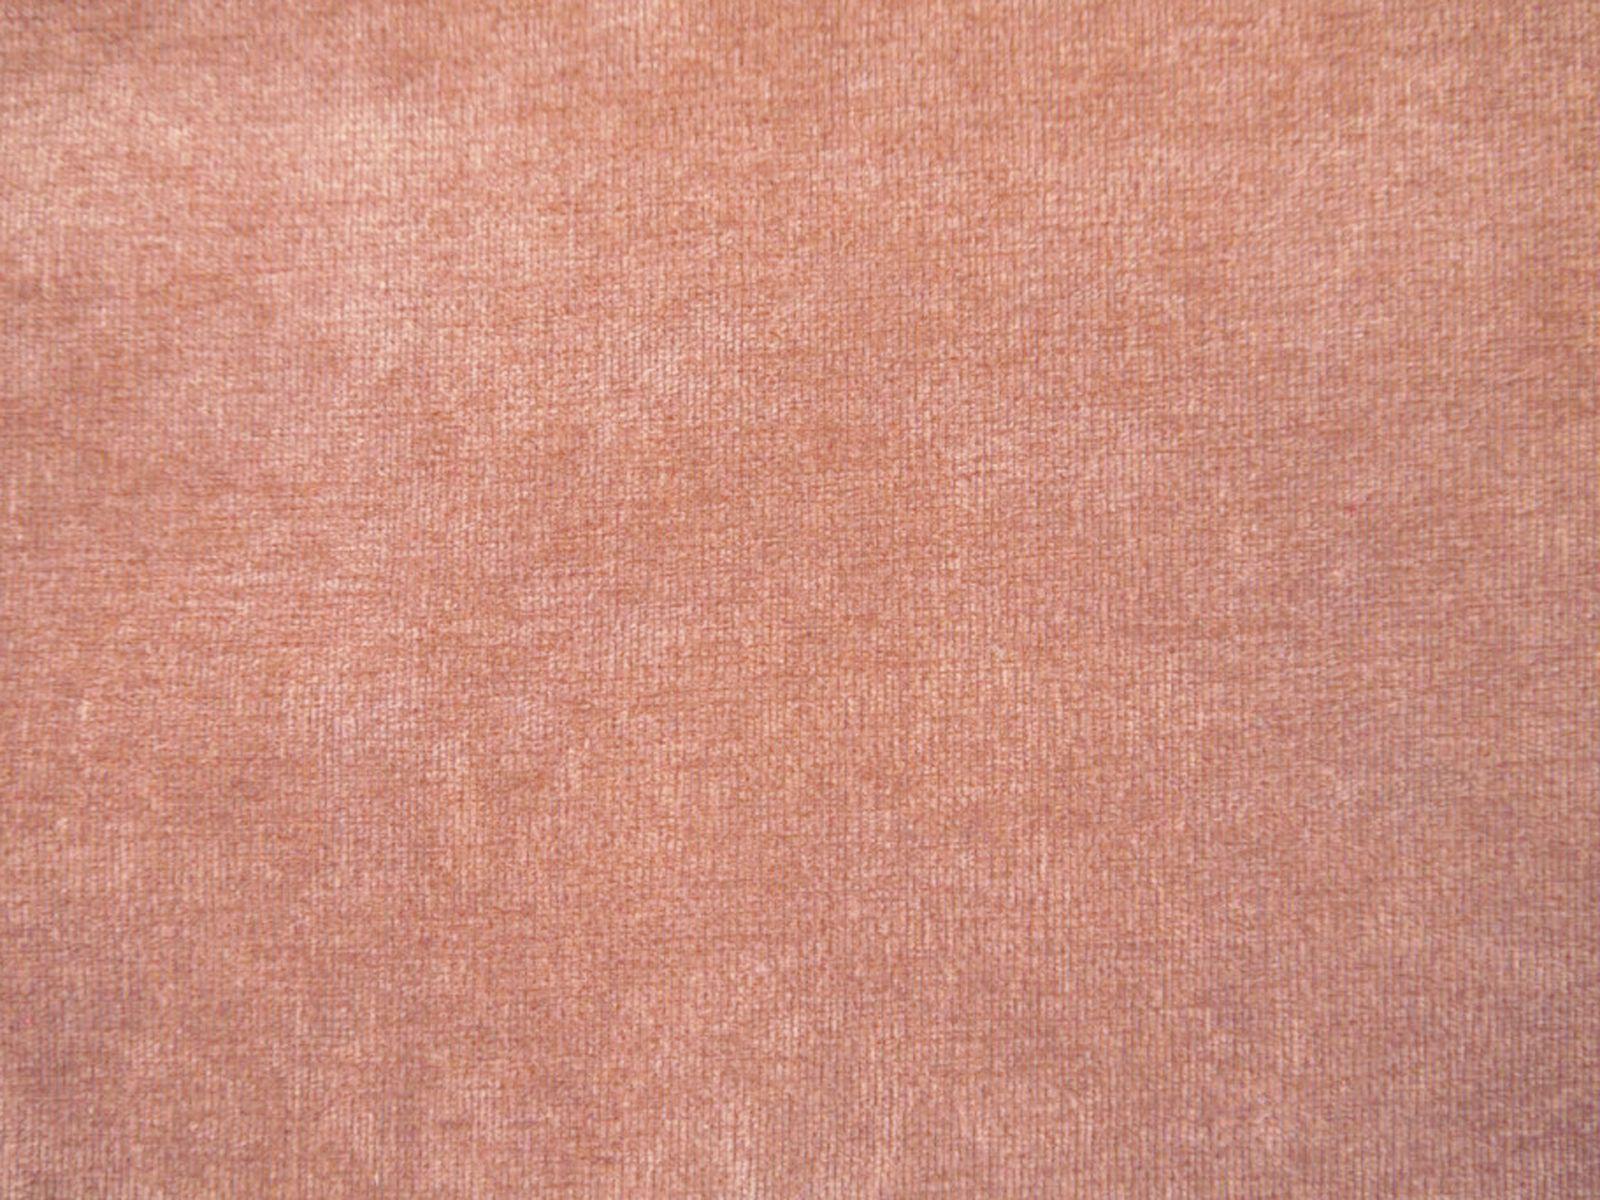 Modelli Fabrics Messina 2064 Salmon Pink Velvet Cubitt Fabric